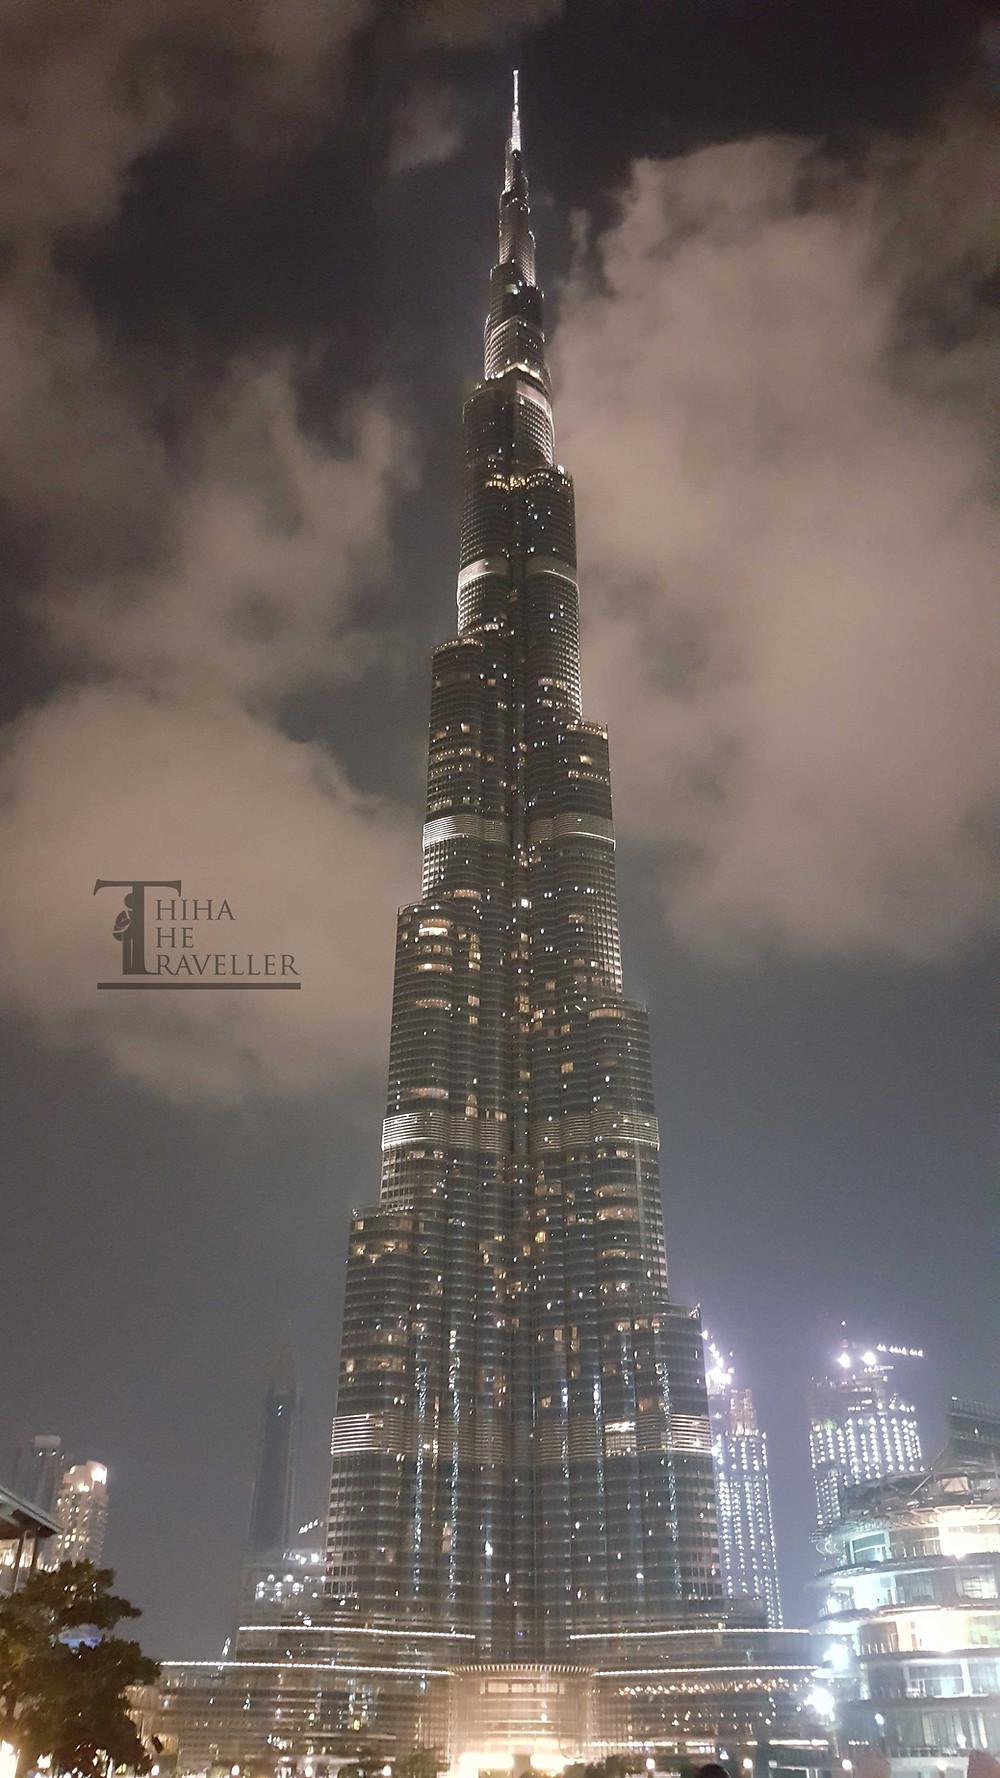 Burj Khalifa အေဆာက္အဦးတစ္ခုလံုးကို ညအလွနဲ႔အတူ ခုလို ျမင္ေတြ႔ရပါတယ္။